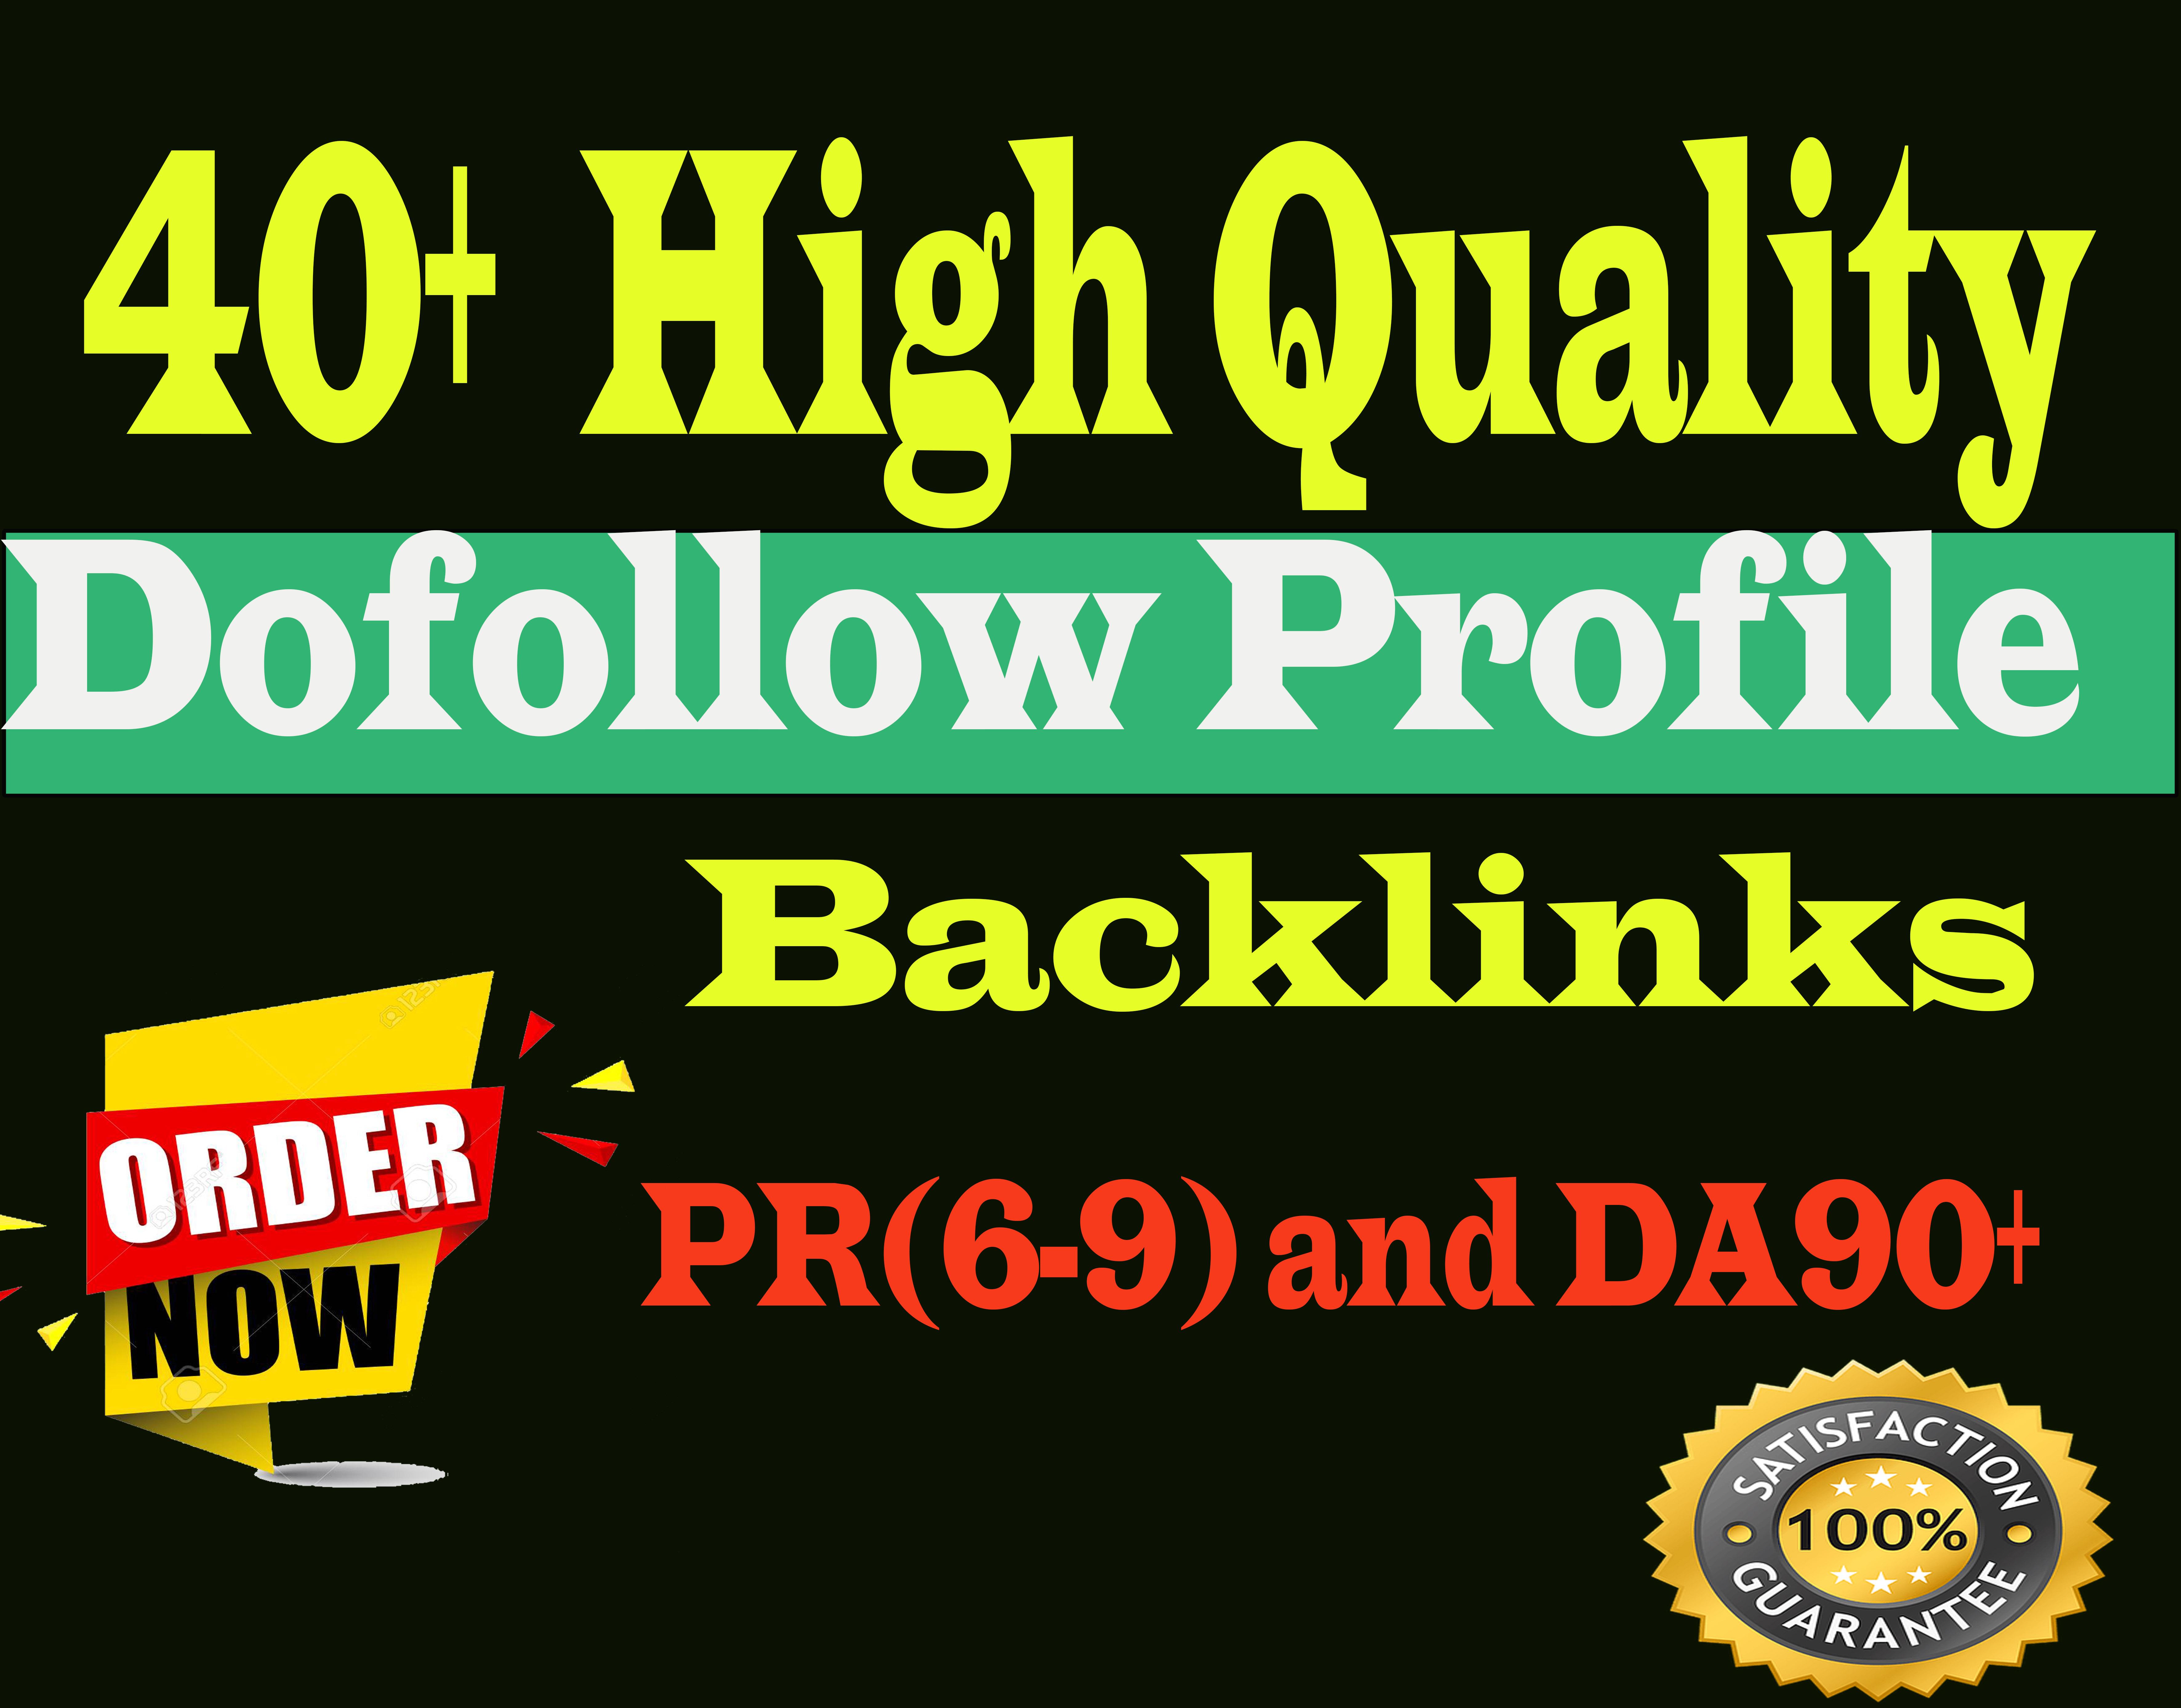 Manully create 40+ high quality DA90 and Pr9 dofolow profile backlinks